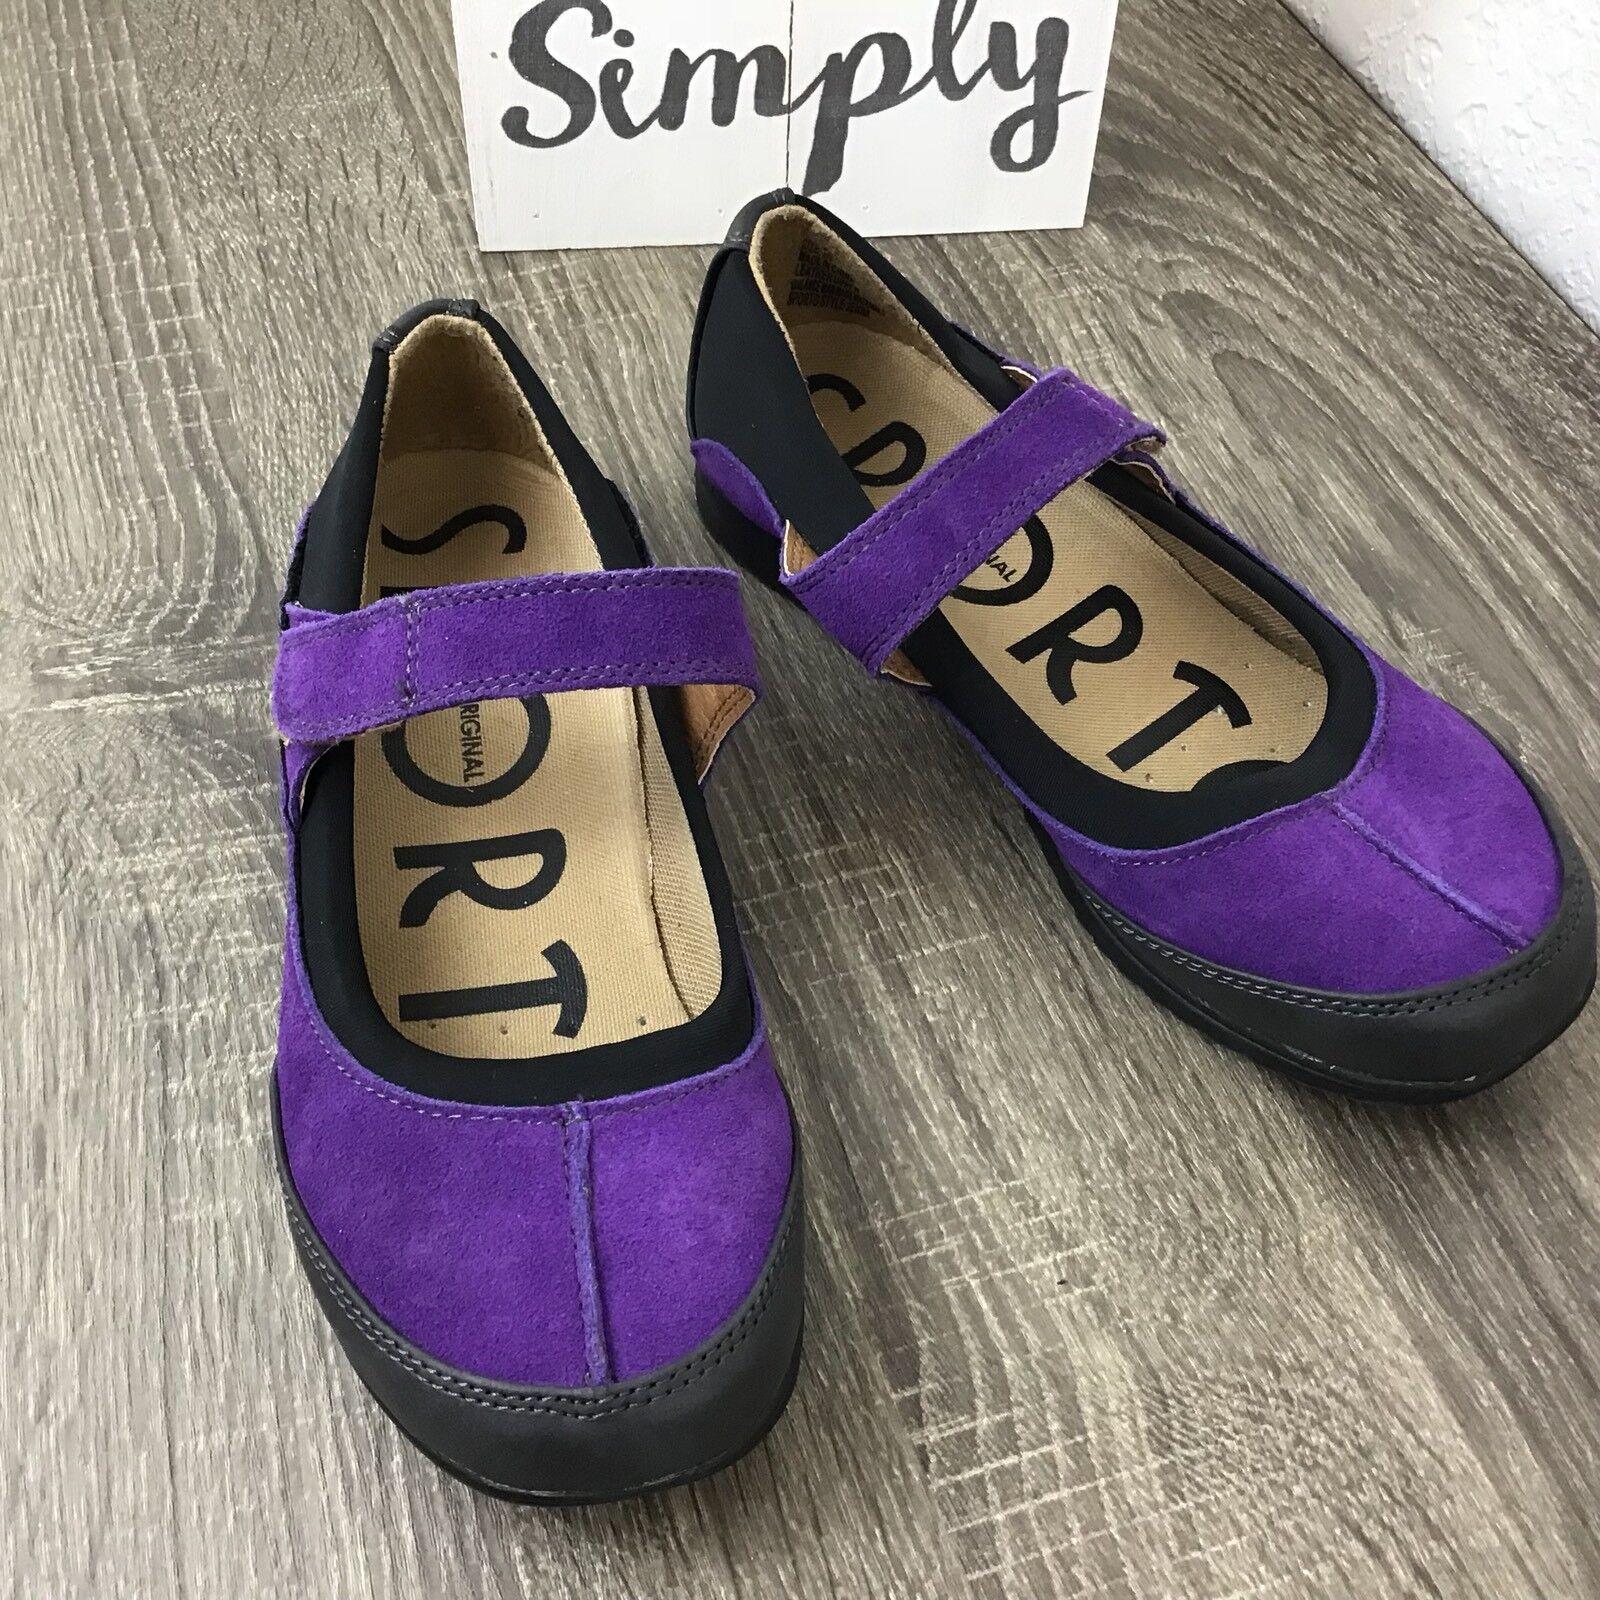 Sporto Jenna Waterproof Suede Mary Janes Leather shoes Purple Size 7